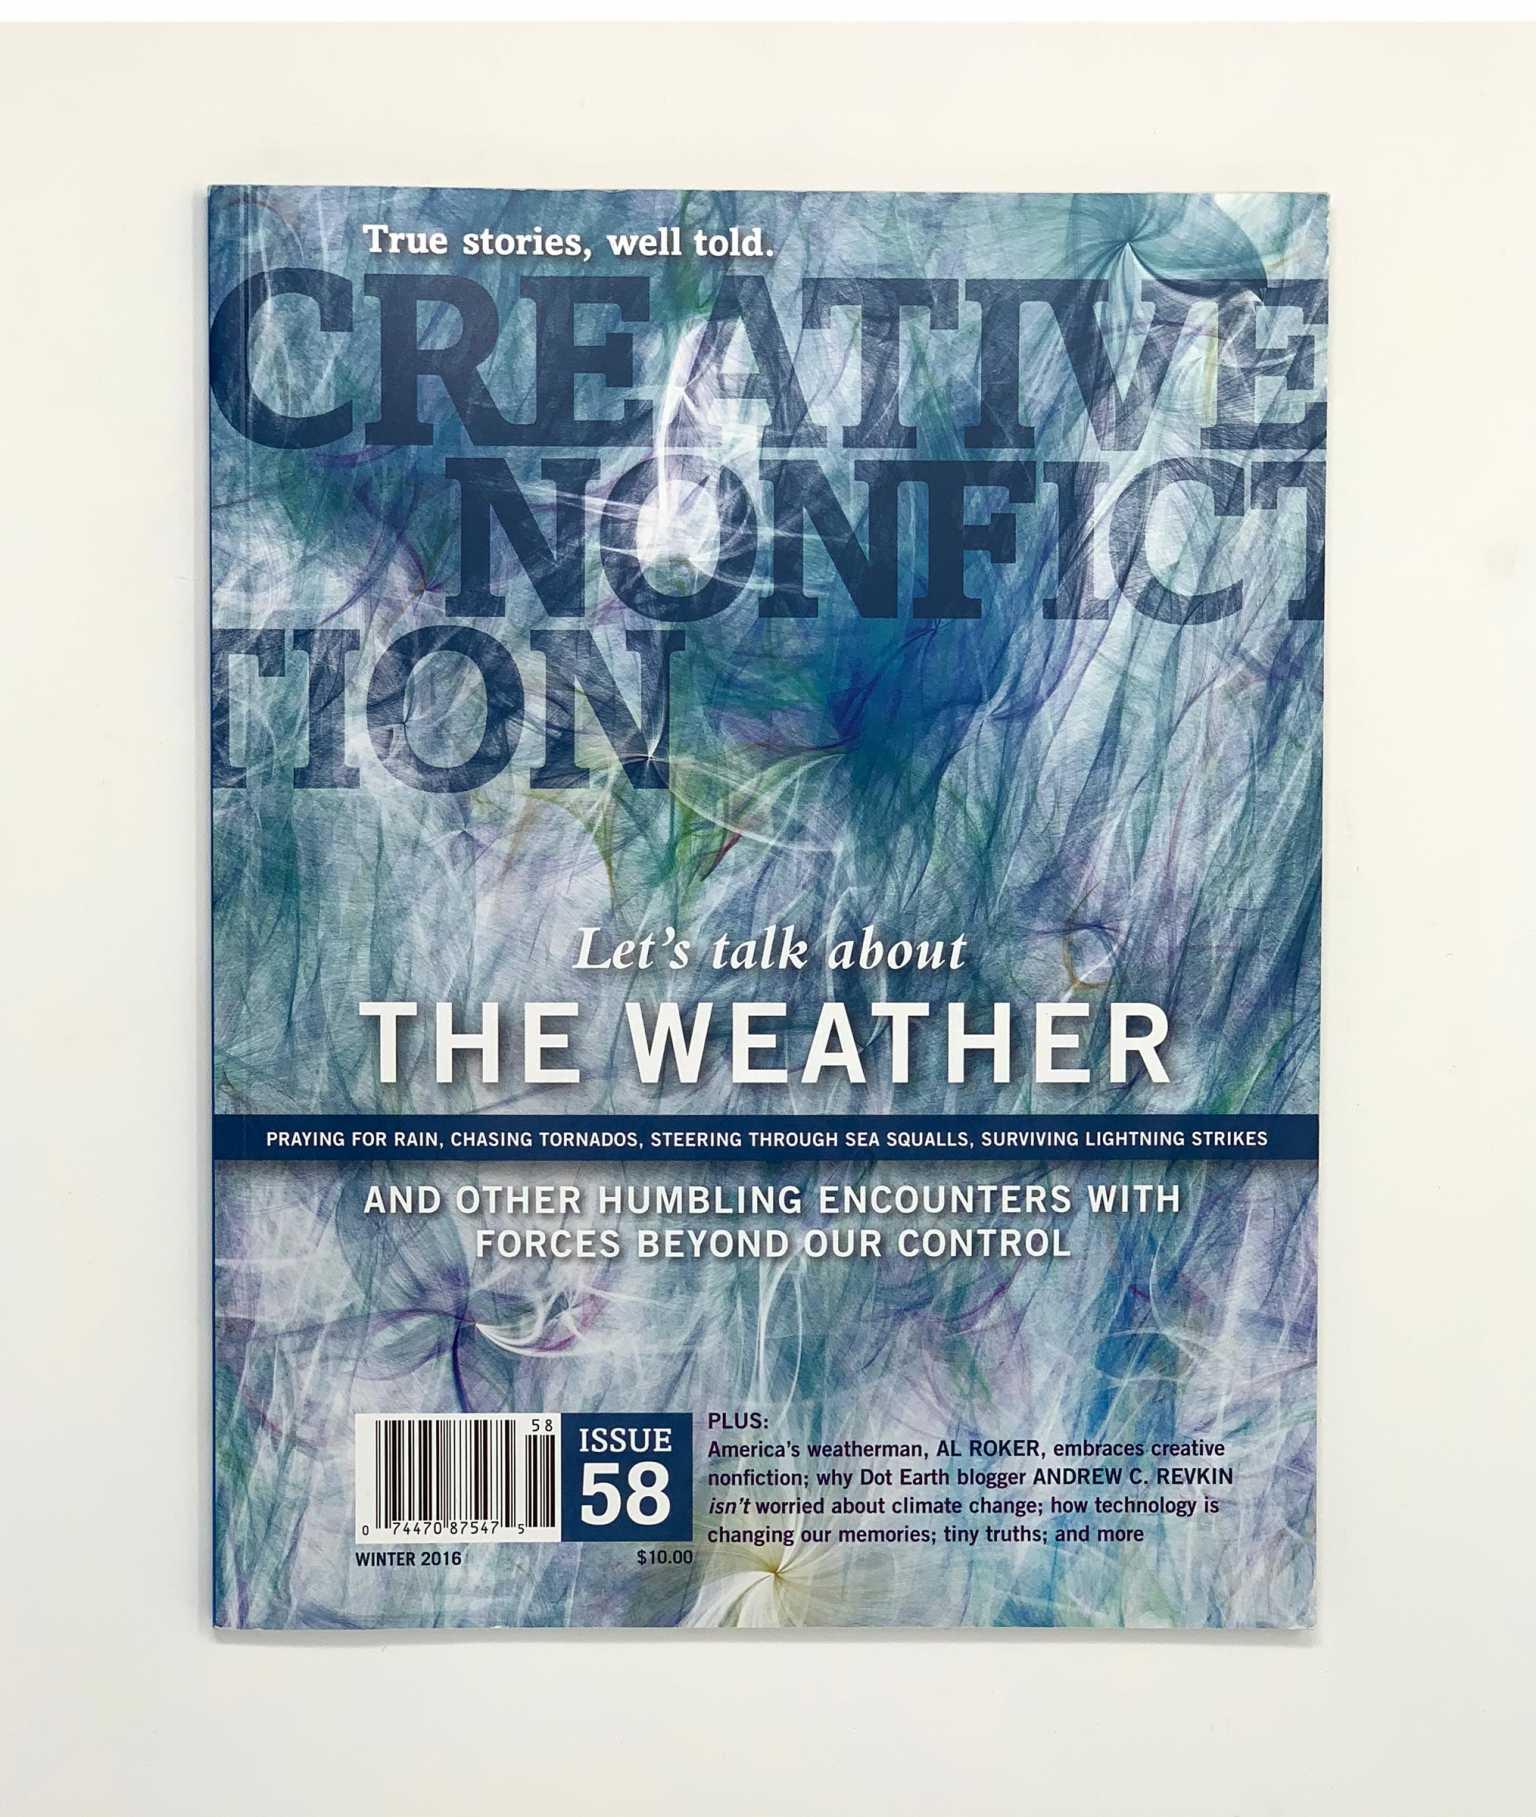 Cover of Creative Nonfiction magazine